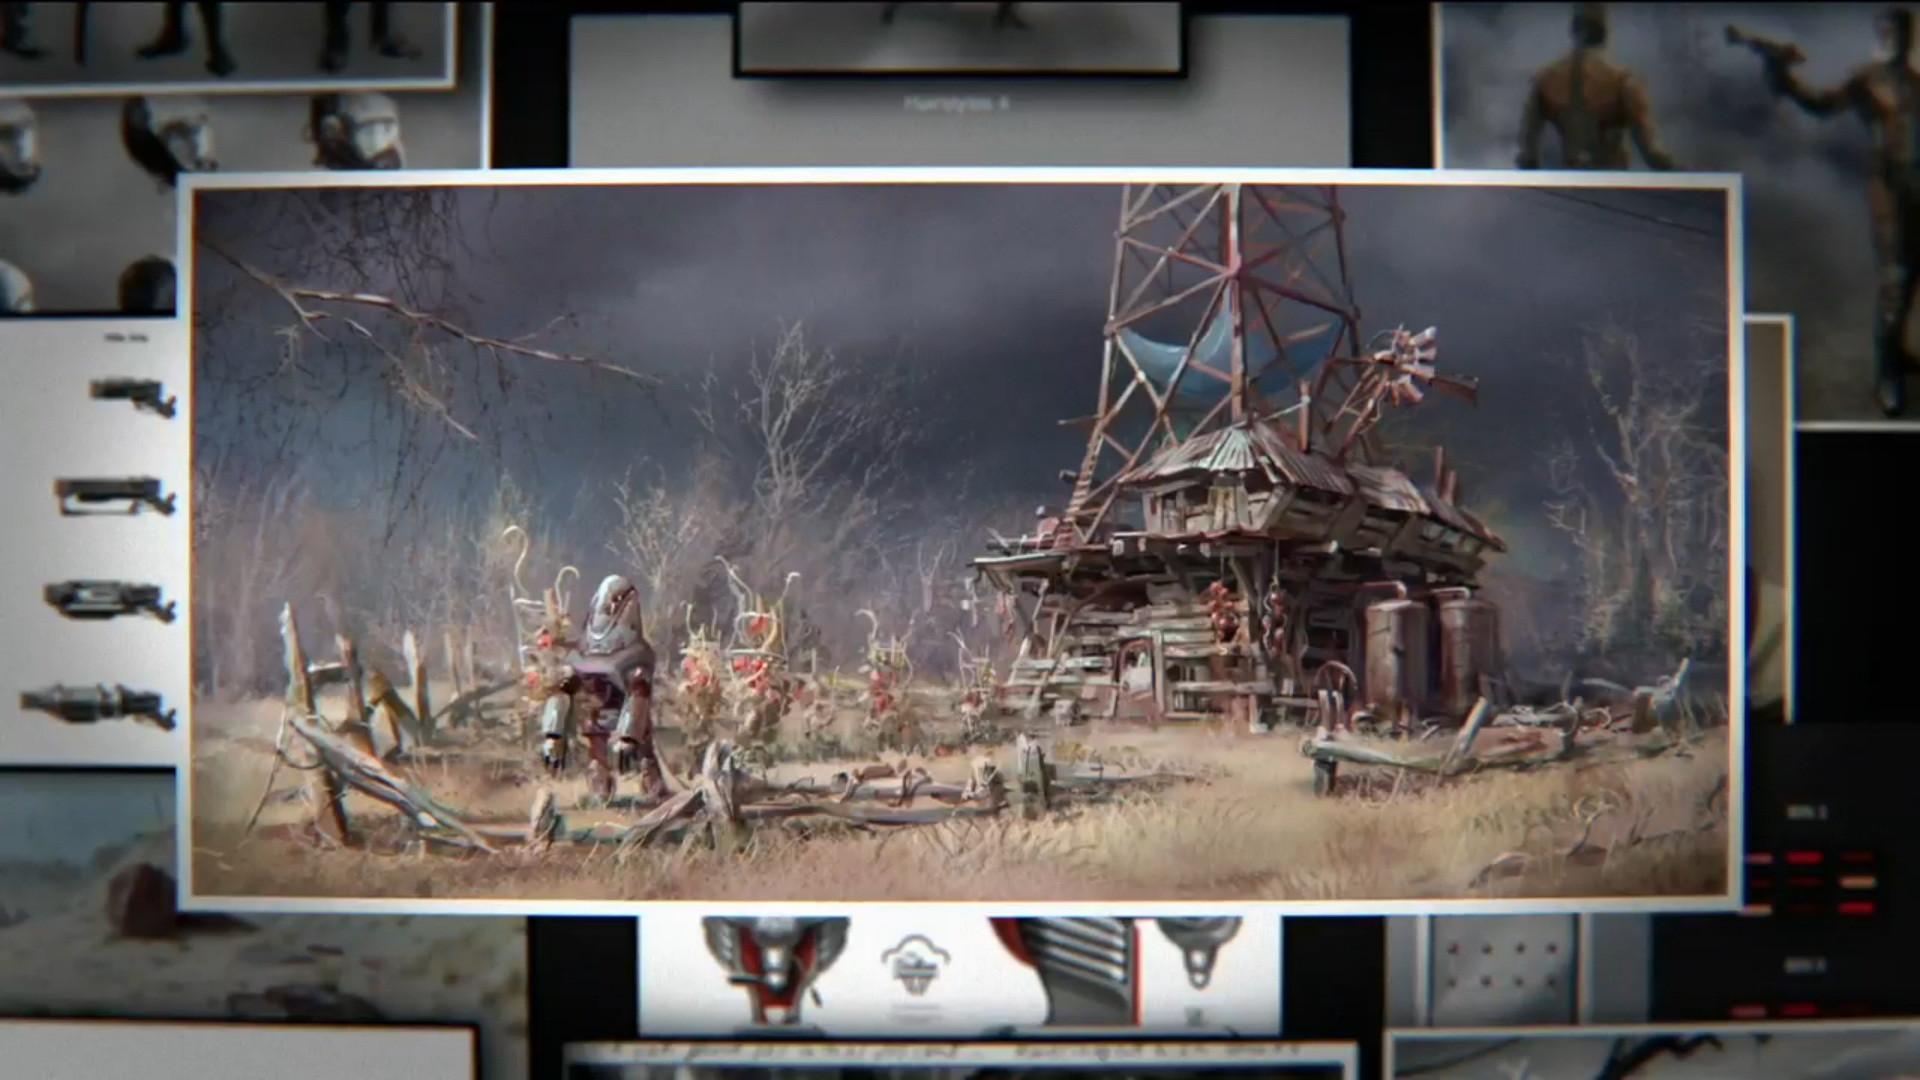 fallout 4 concept art wallpaper images (11)